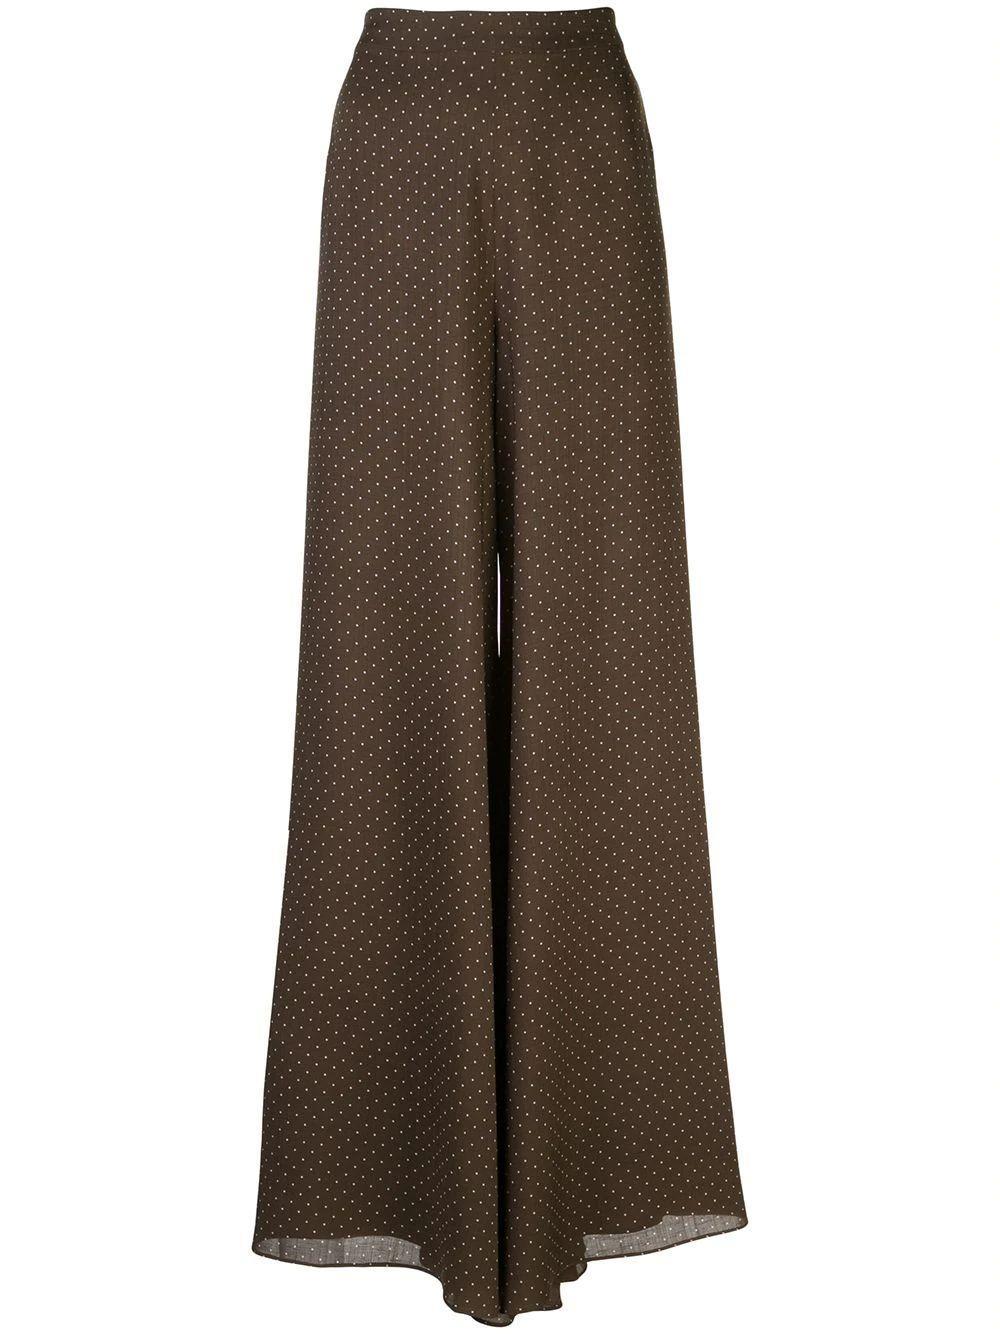 Antonin Linen Polka Dot Wide Leg Pant